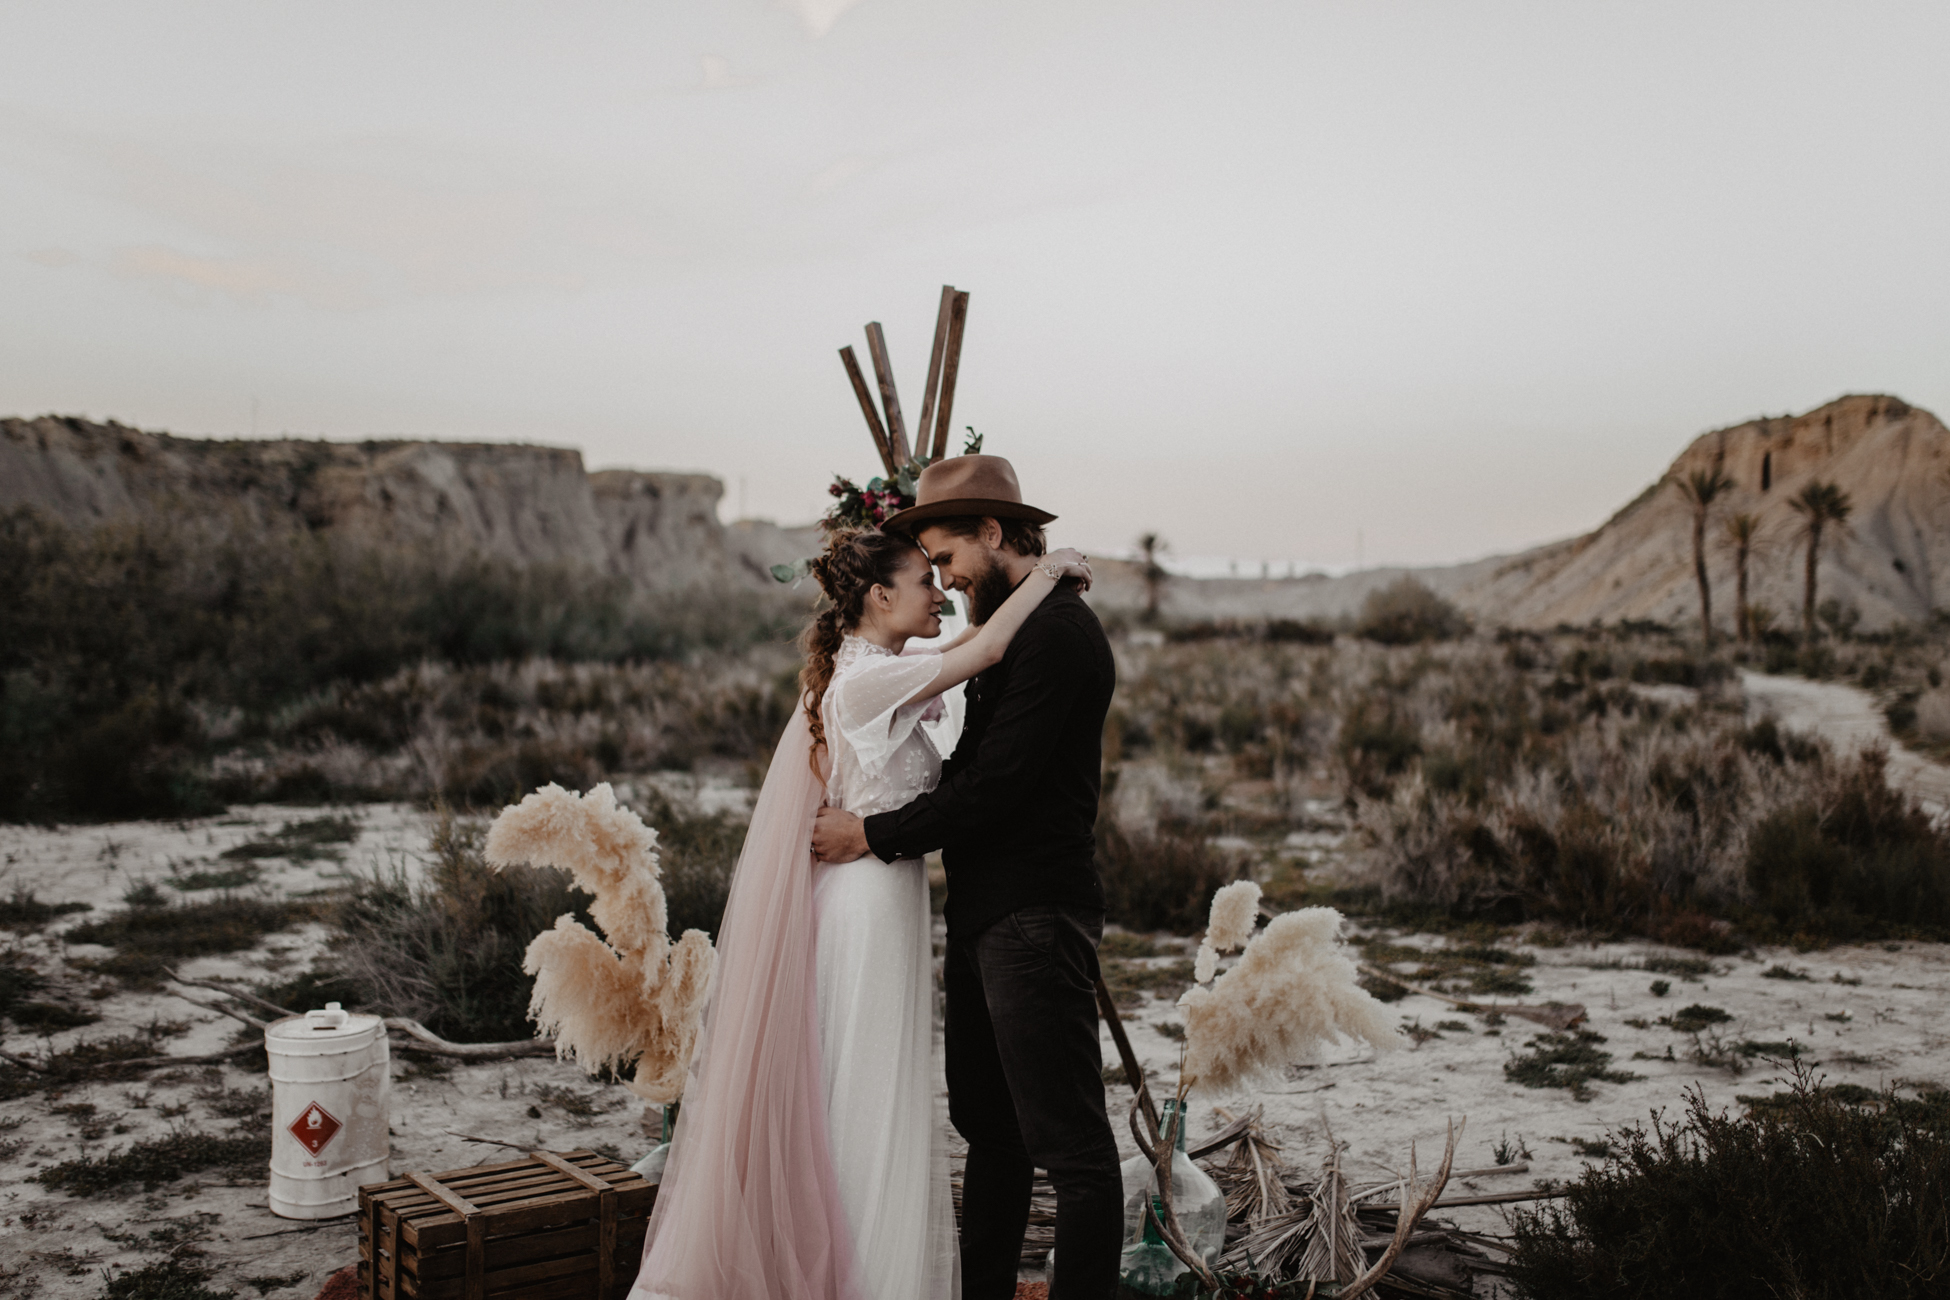 thenortherngirlphotography_photography_thenortherngirl_rebeccascabros_wedding_weddingphotography_weddingphotographer_wood_muebles_deco_bodasdecaramelo_home_bedtime_gaywedding_editorial_desierto_desert_wildestdreams_amortexano-382.jpg